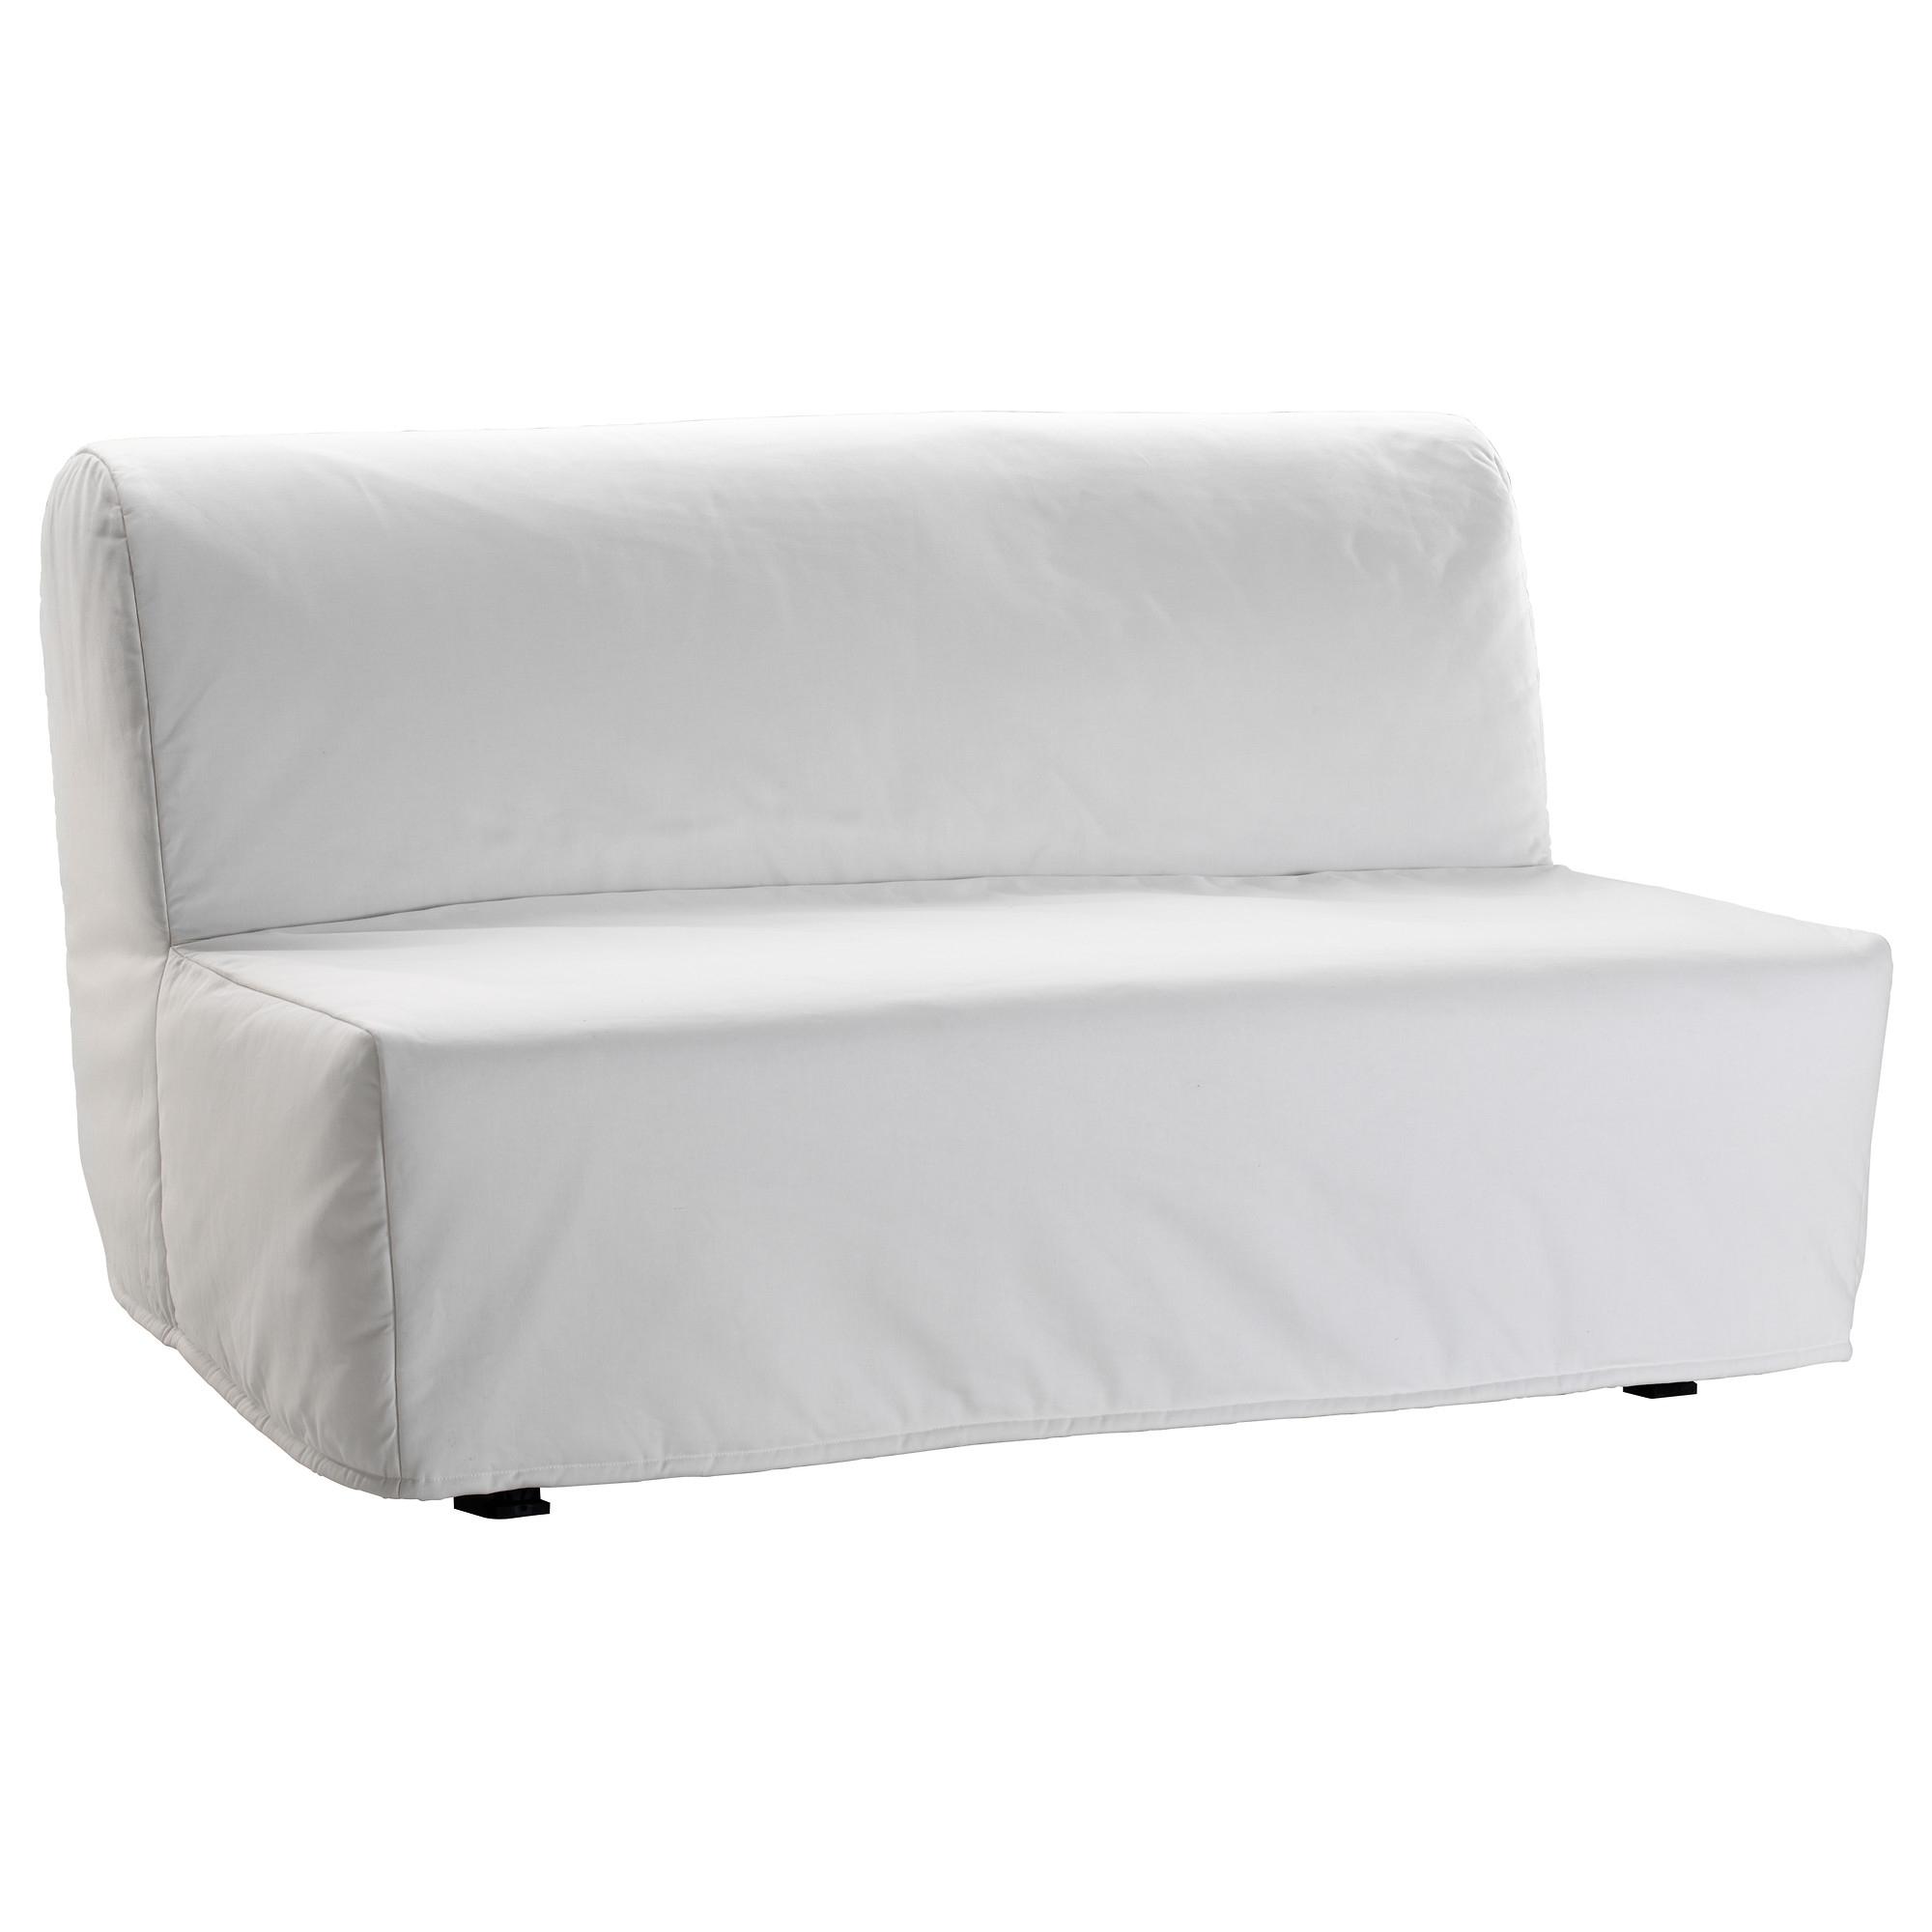 Lycksele Lövås Sleeper Sofa – Ransta White – Ikea With Widely Used Ikea Loveseat Sleeper Sofas (View 12 of 15)